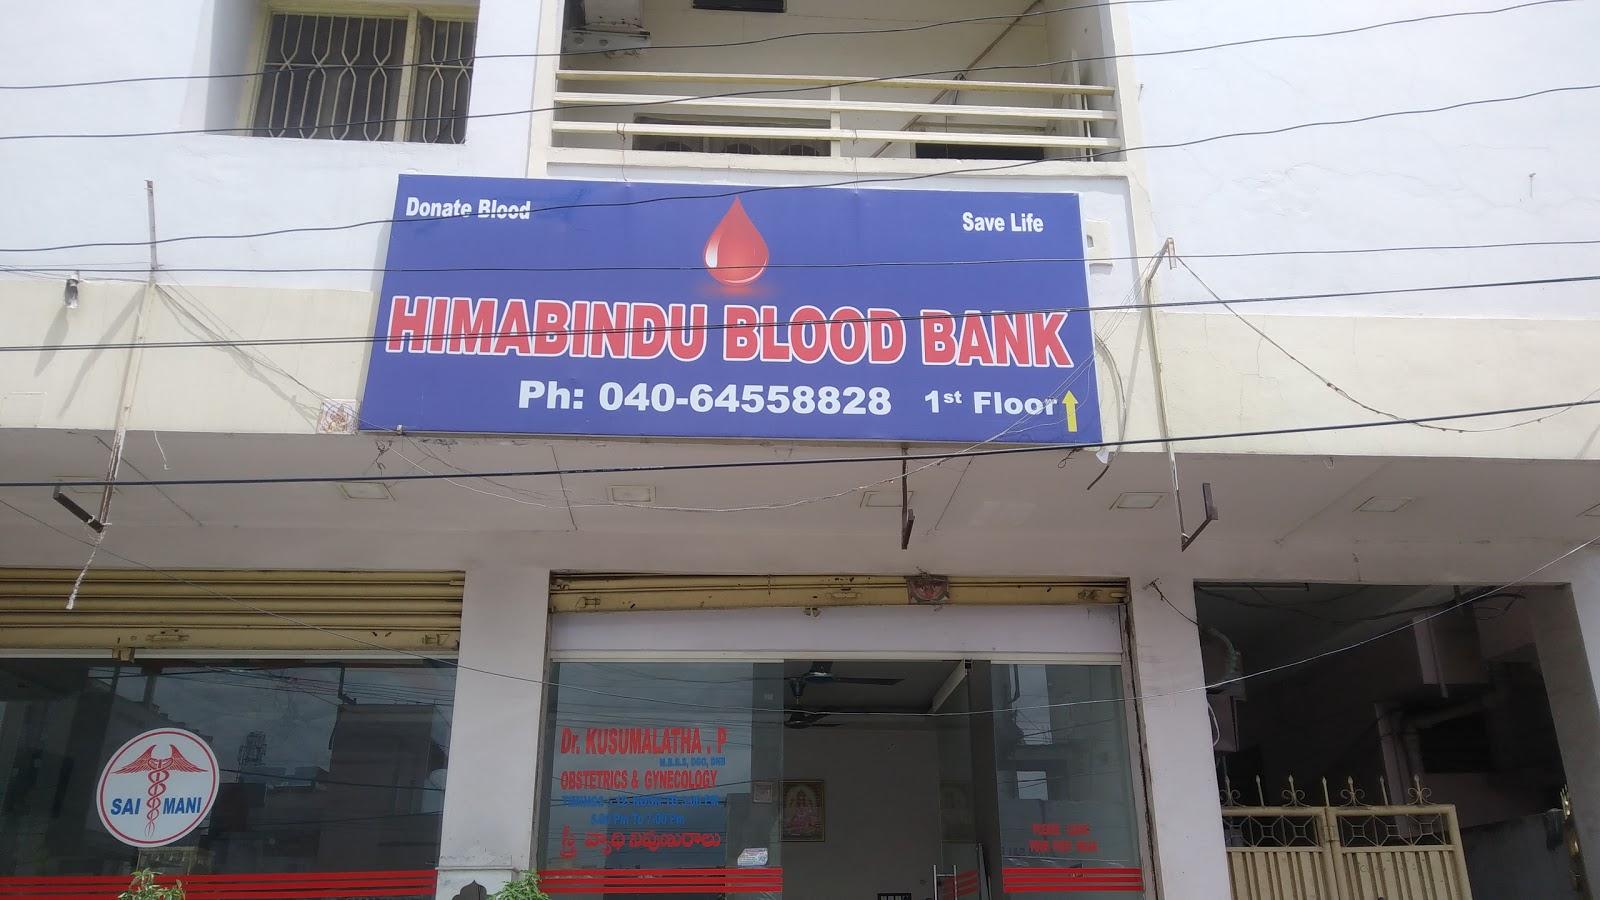 bloodbank image